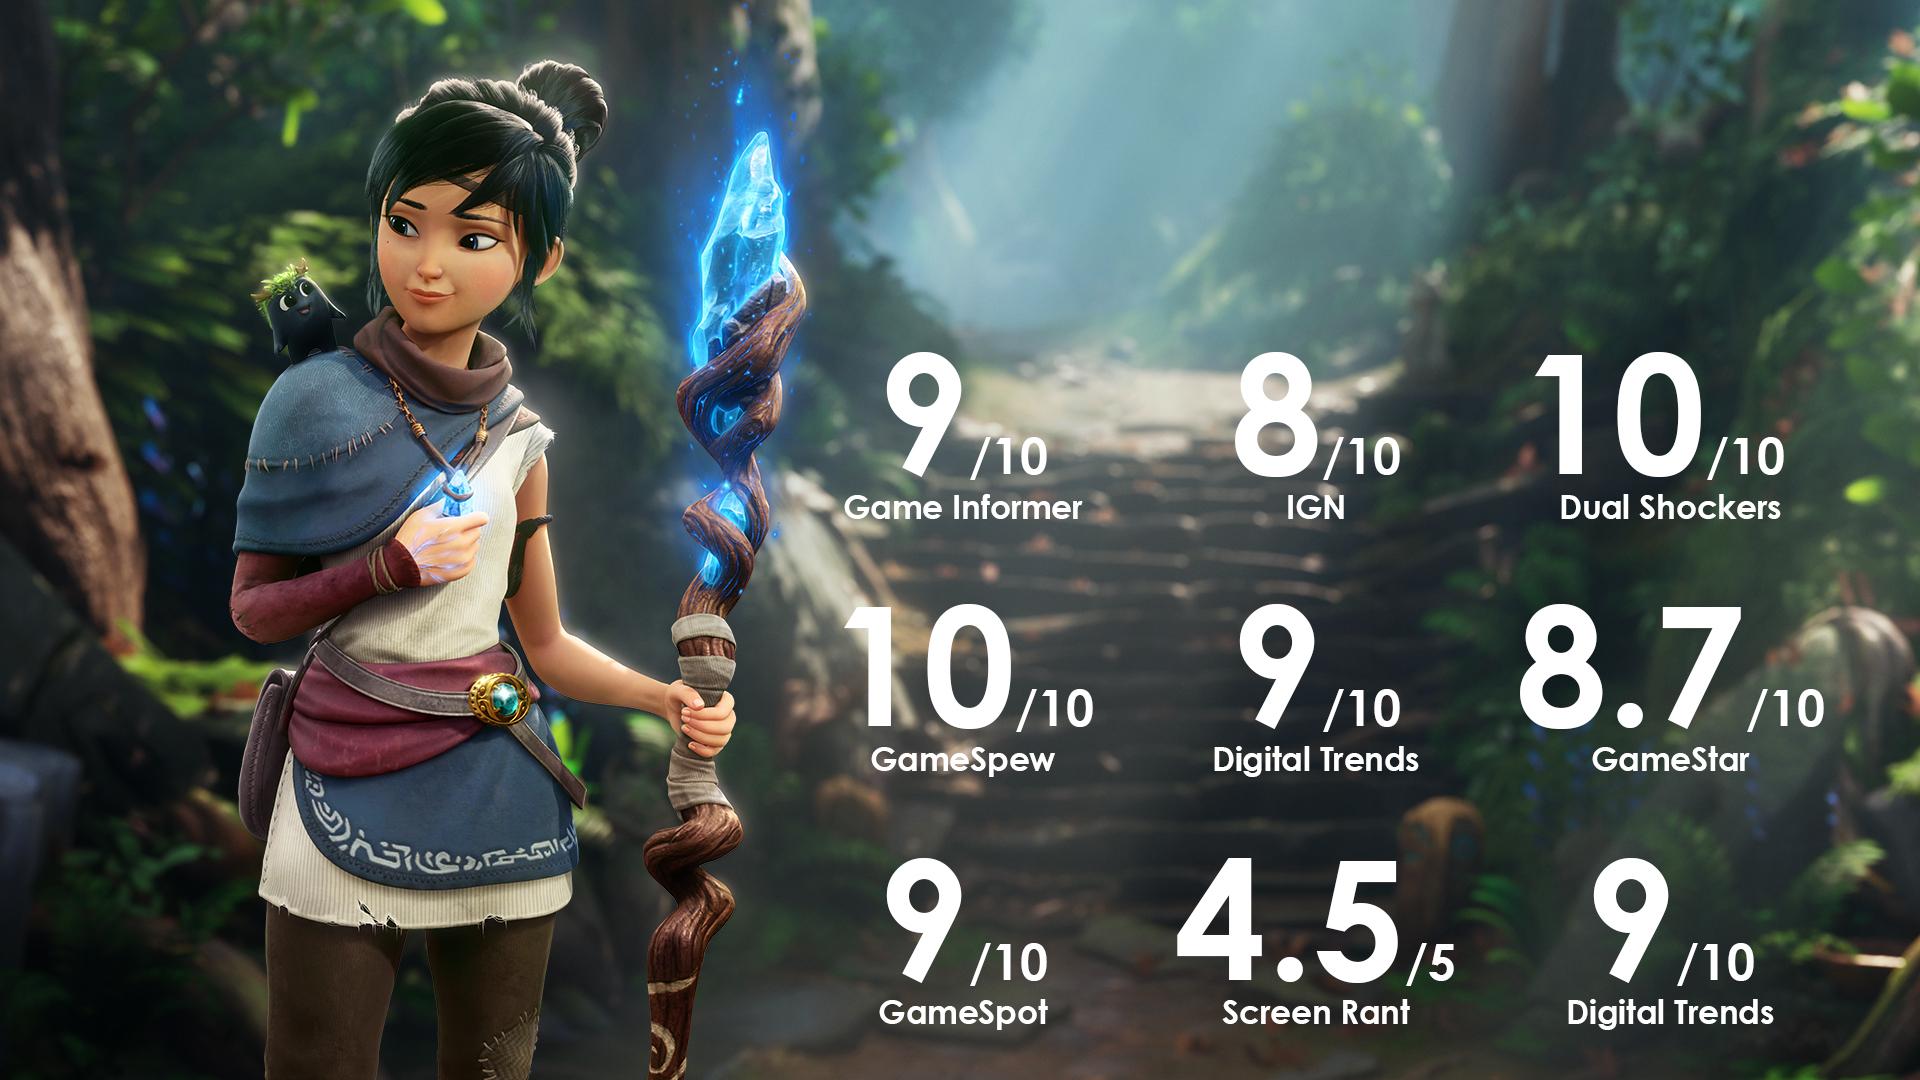 Play Kena: Bridge of Spirits on Epic Games Store